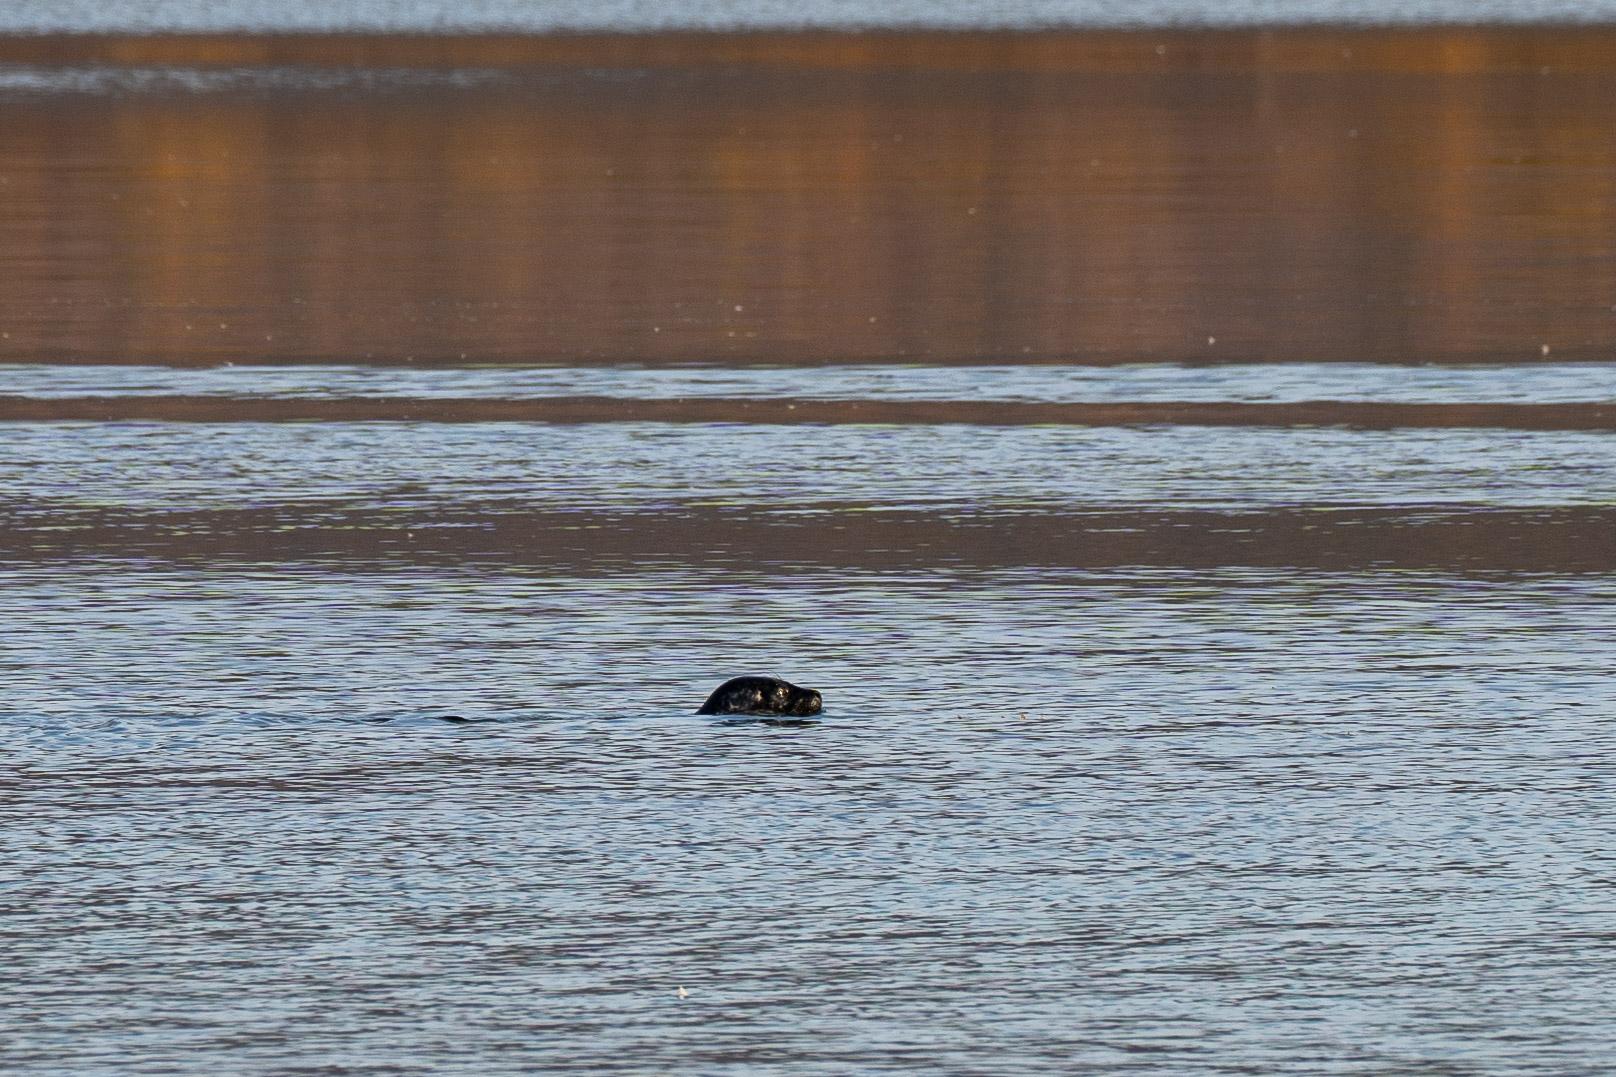 Wohl Robbe (oder doch Otter?)